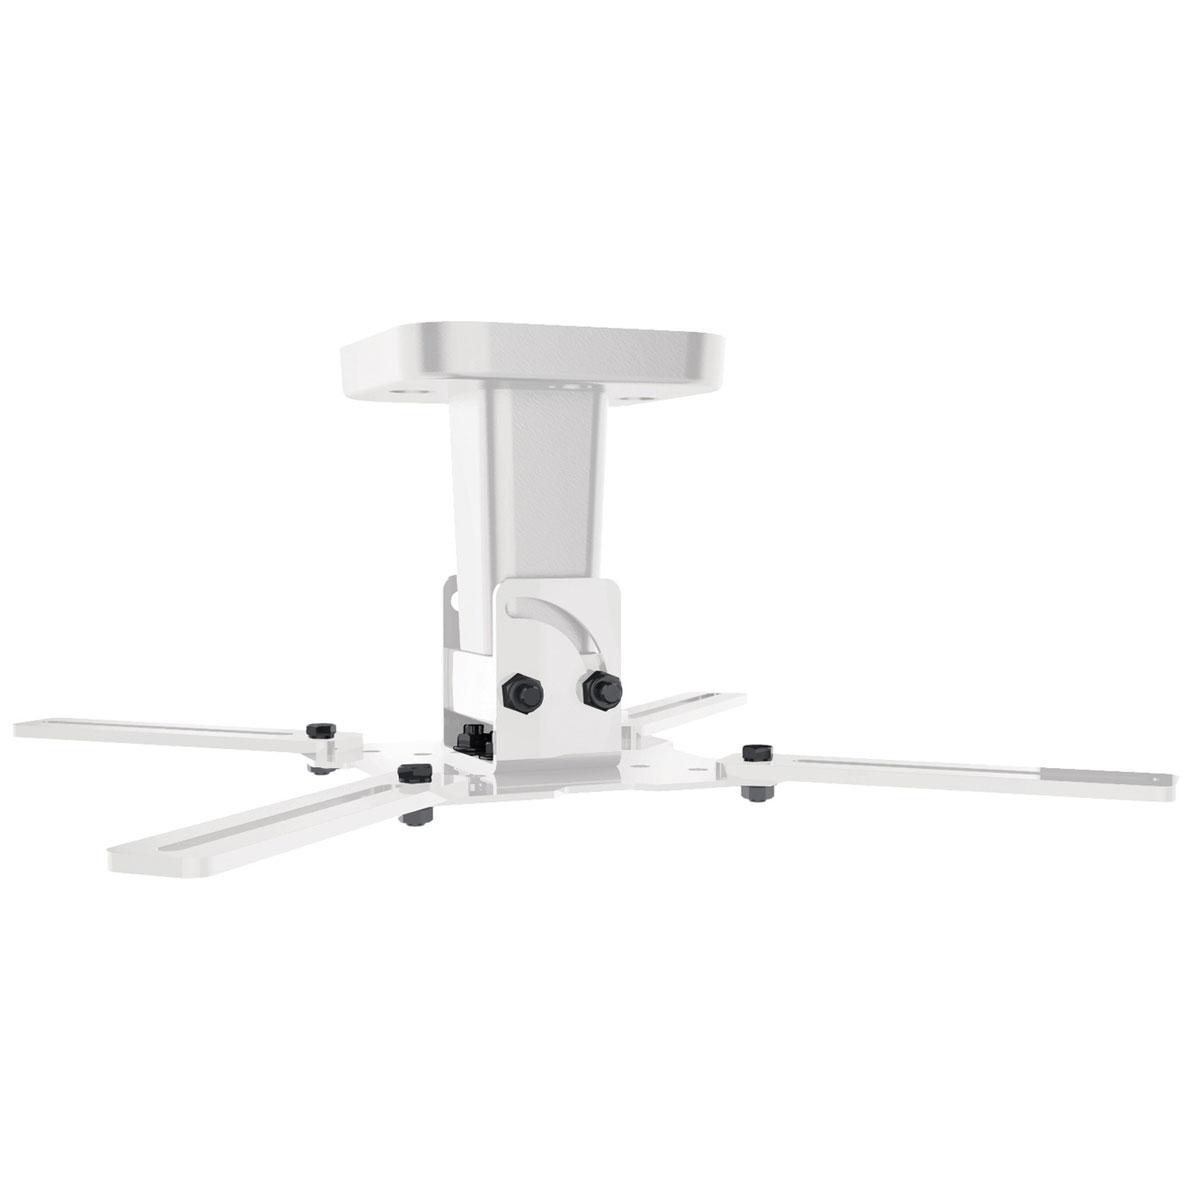 meliconi pro 100 blanc support plafond vid oprojecteur. Black Bedroom Furniture Sets. Home Design Ideas